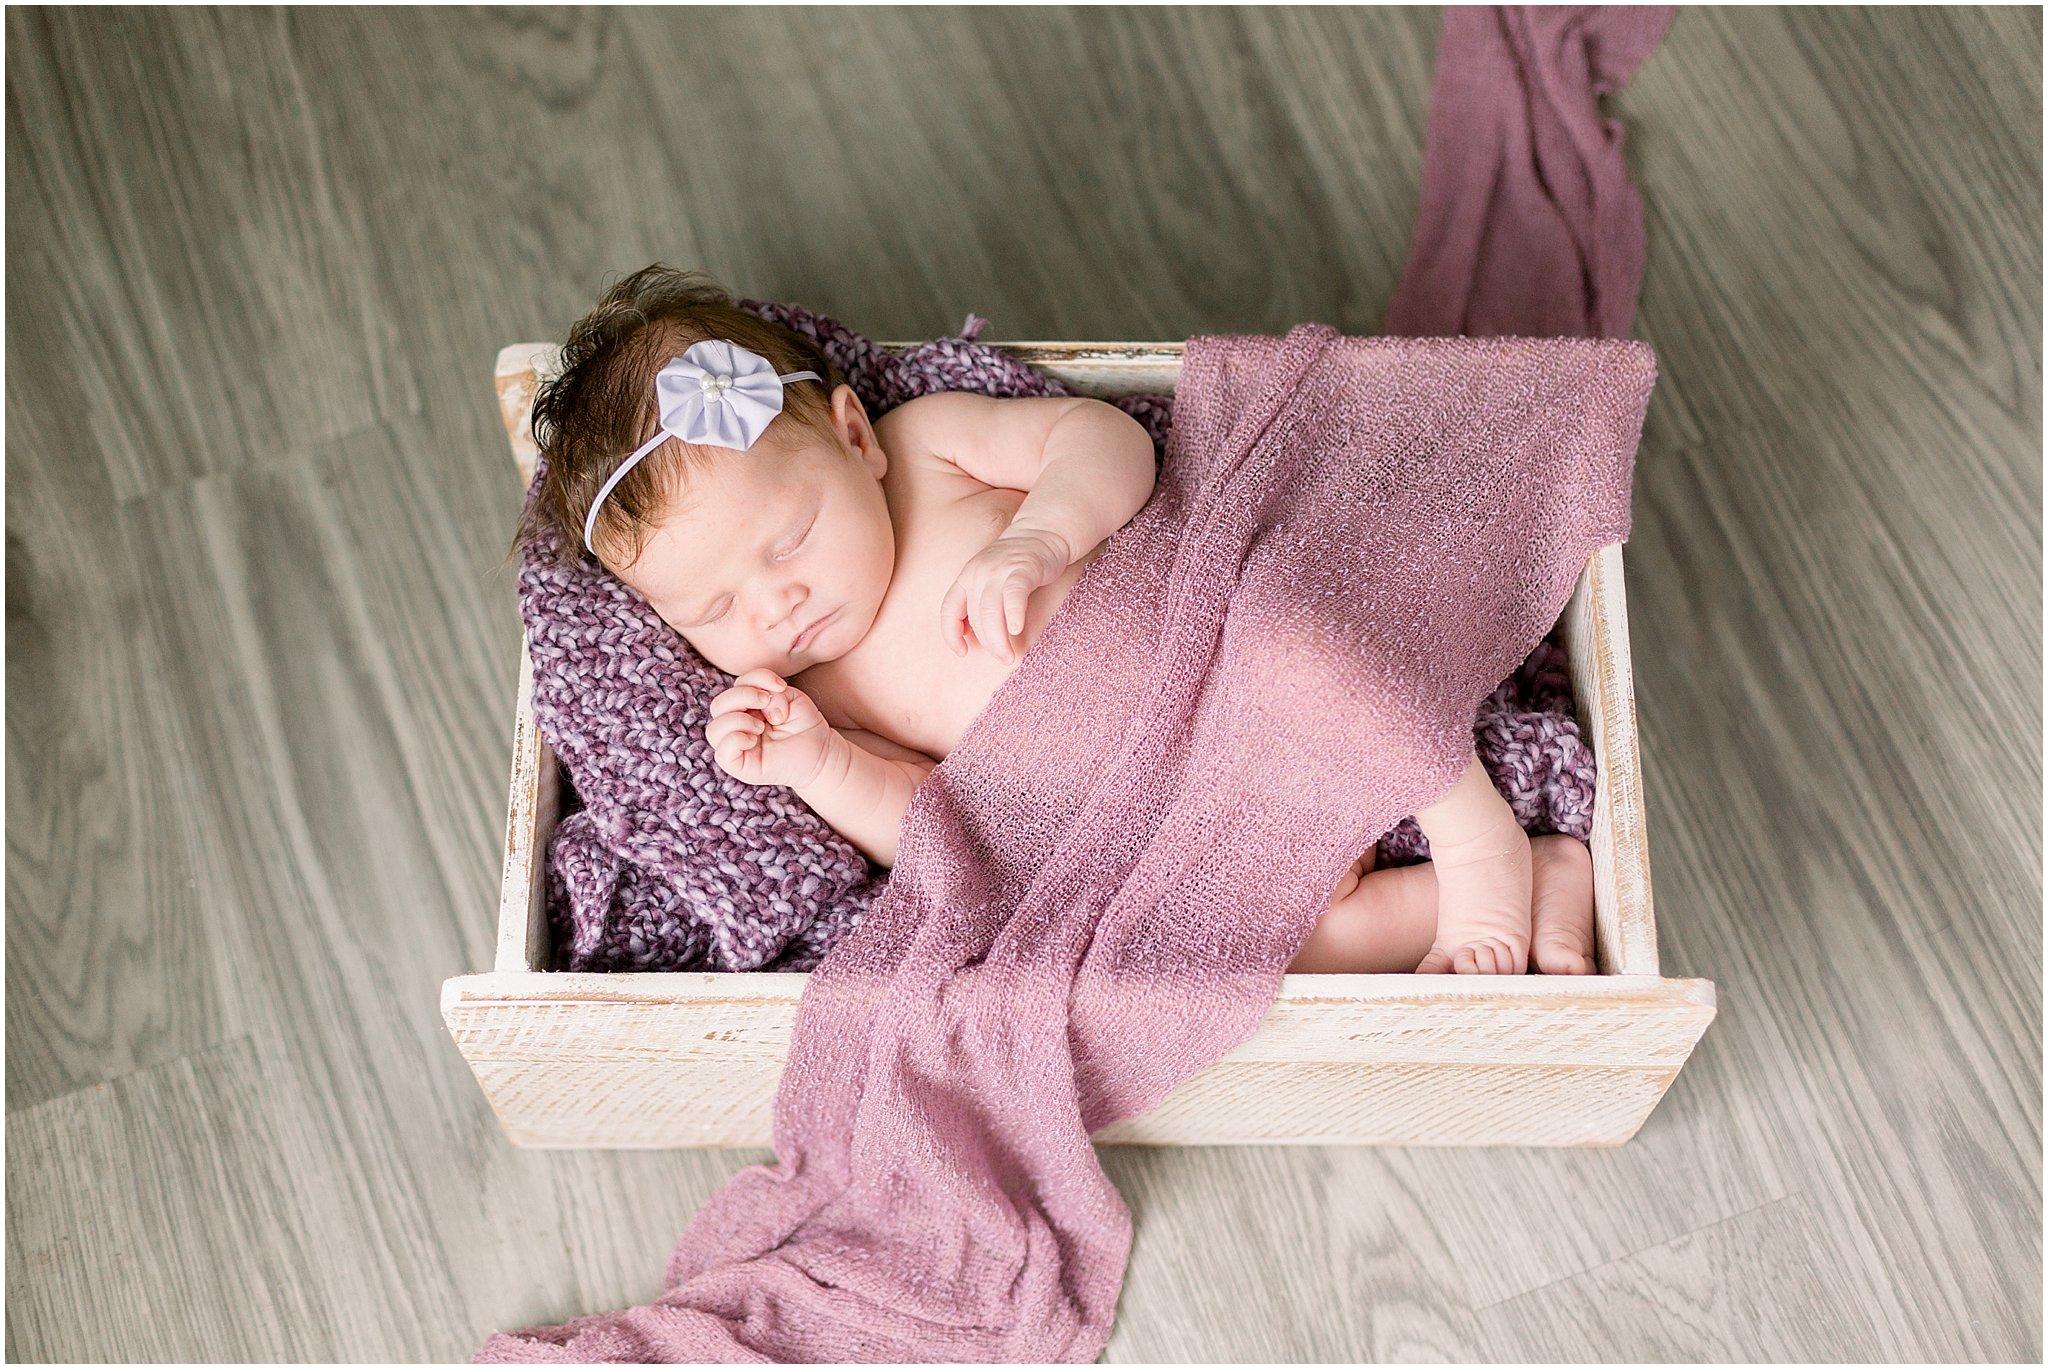 Winter-Garden-Maternity-Newborn-Photographer_0035.jpg